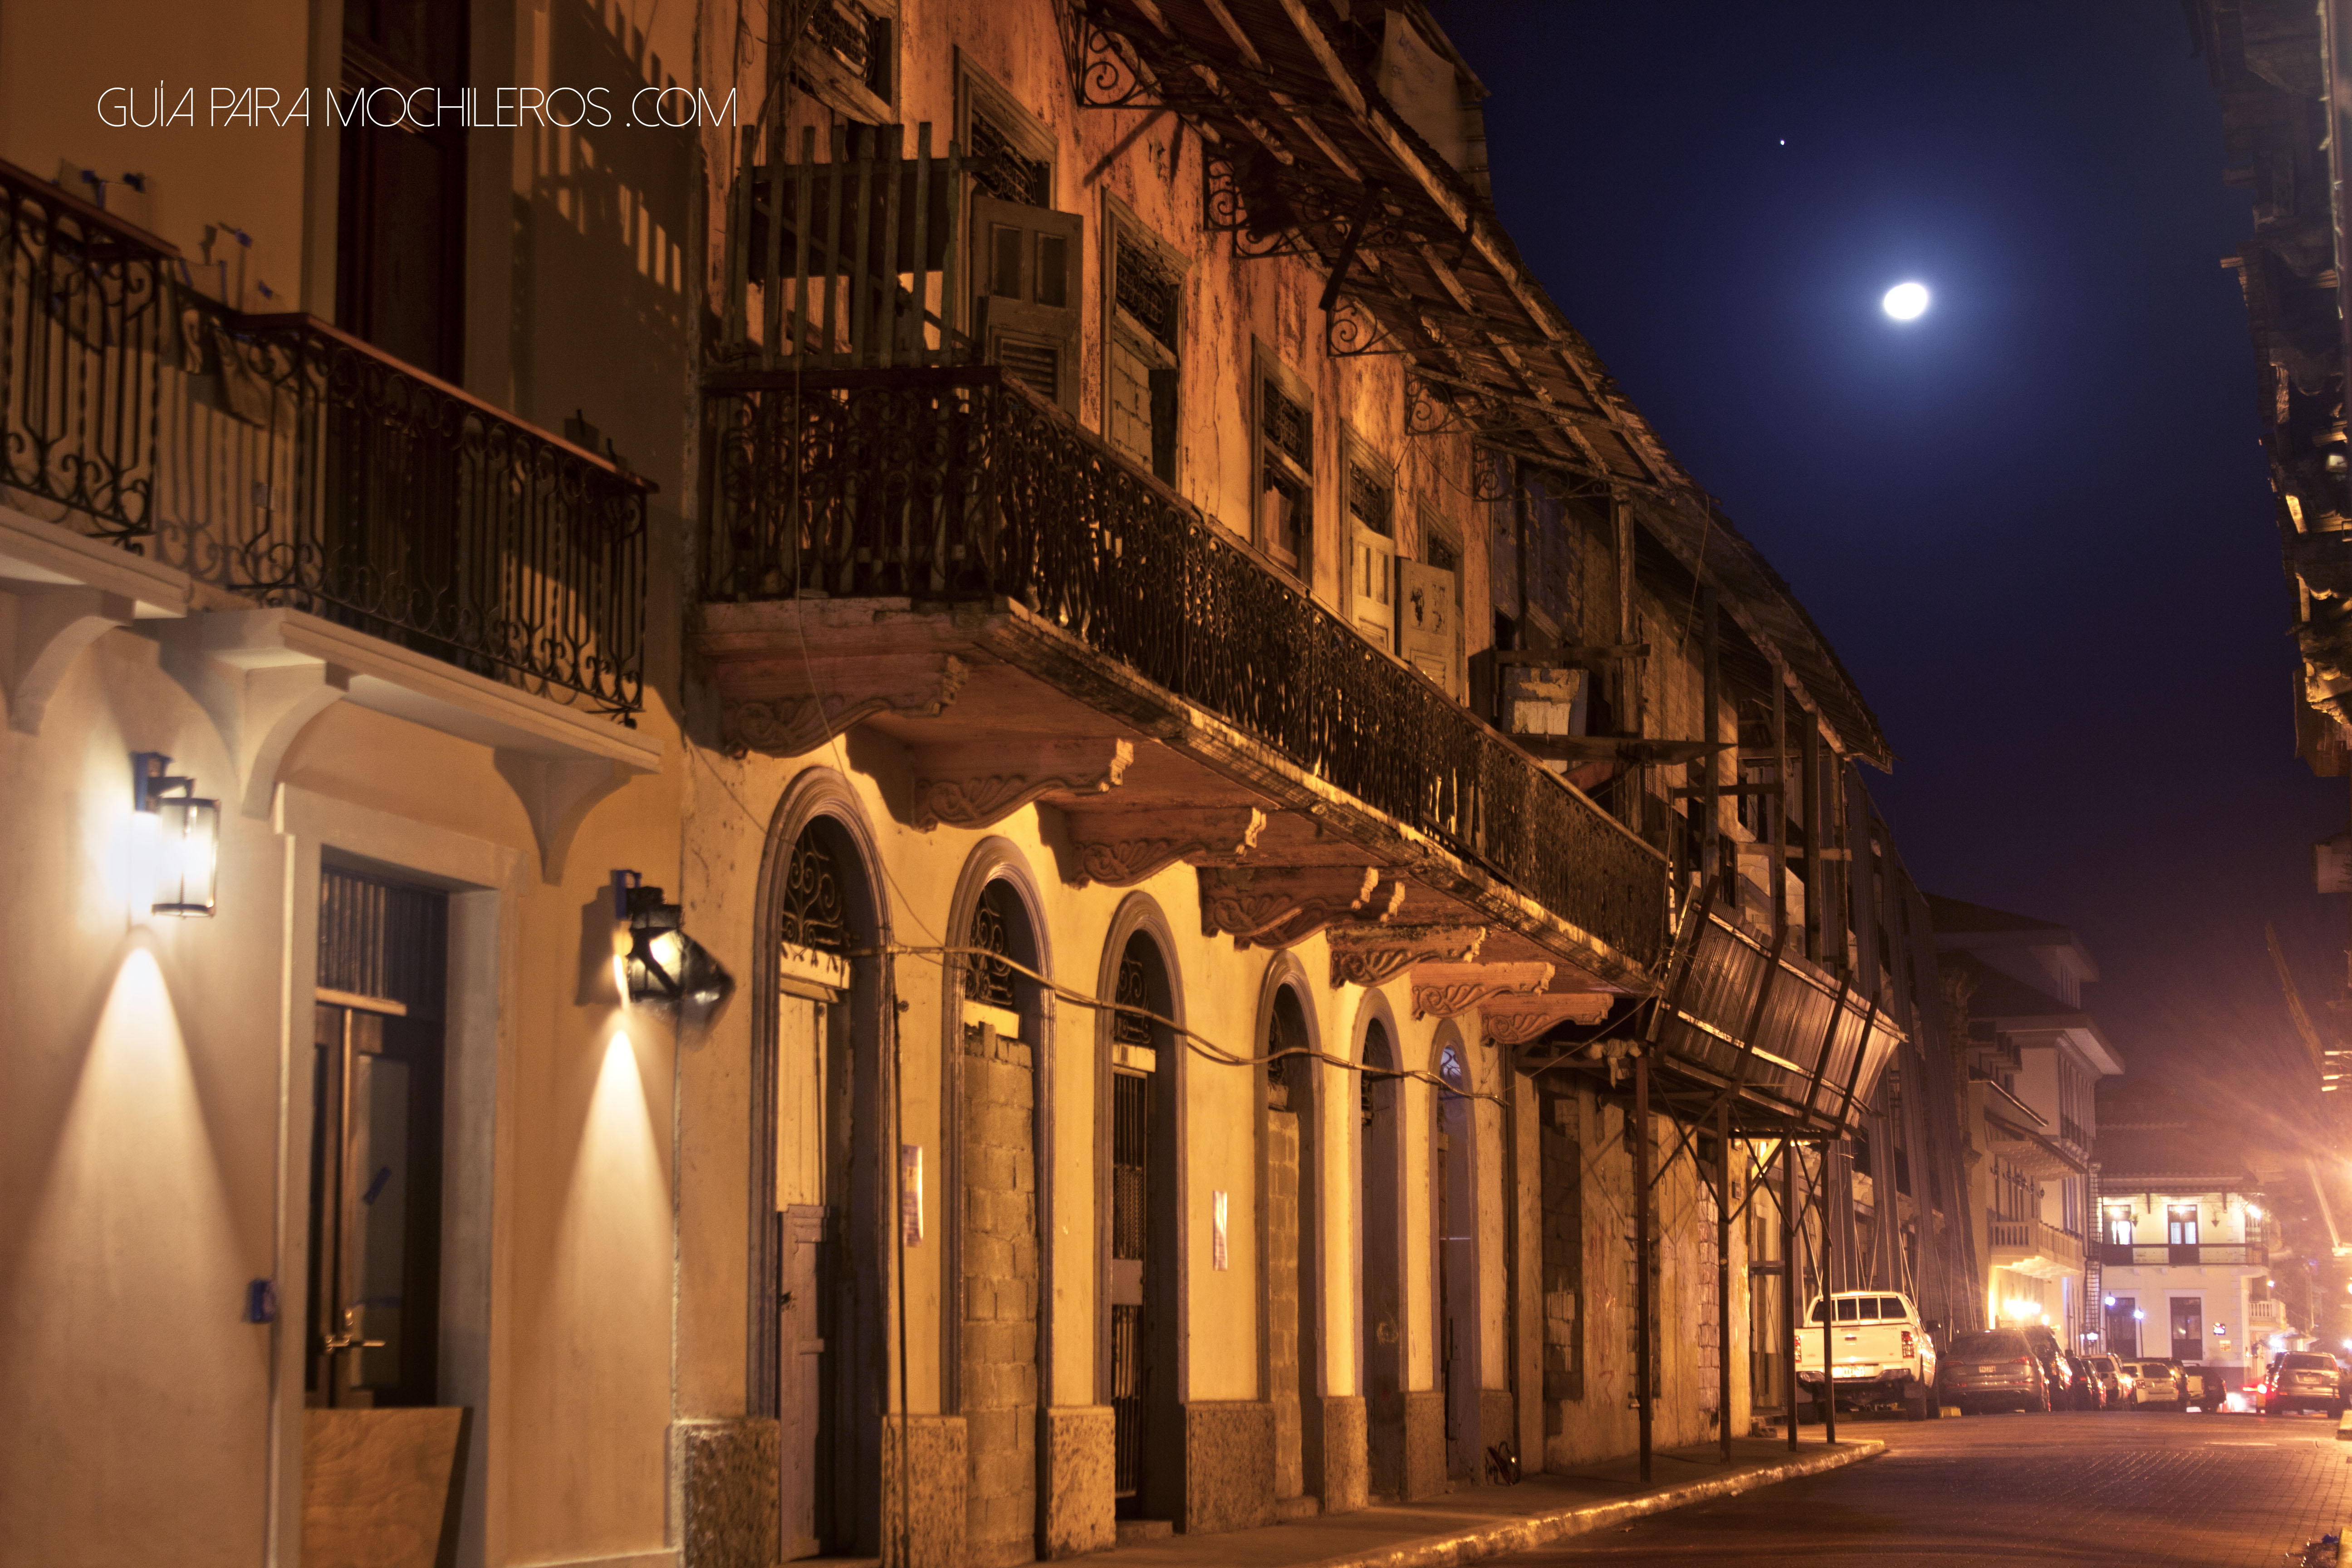 Casco antiguo Panamá noche